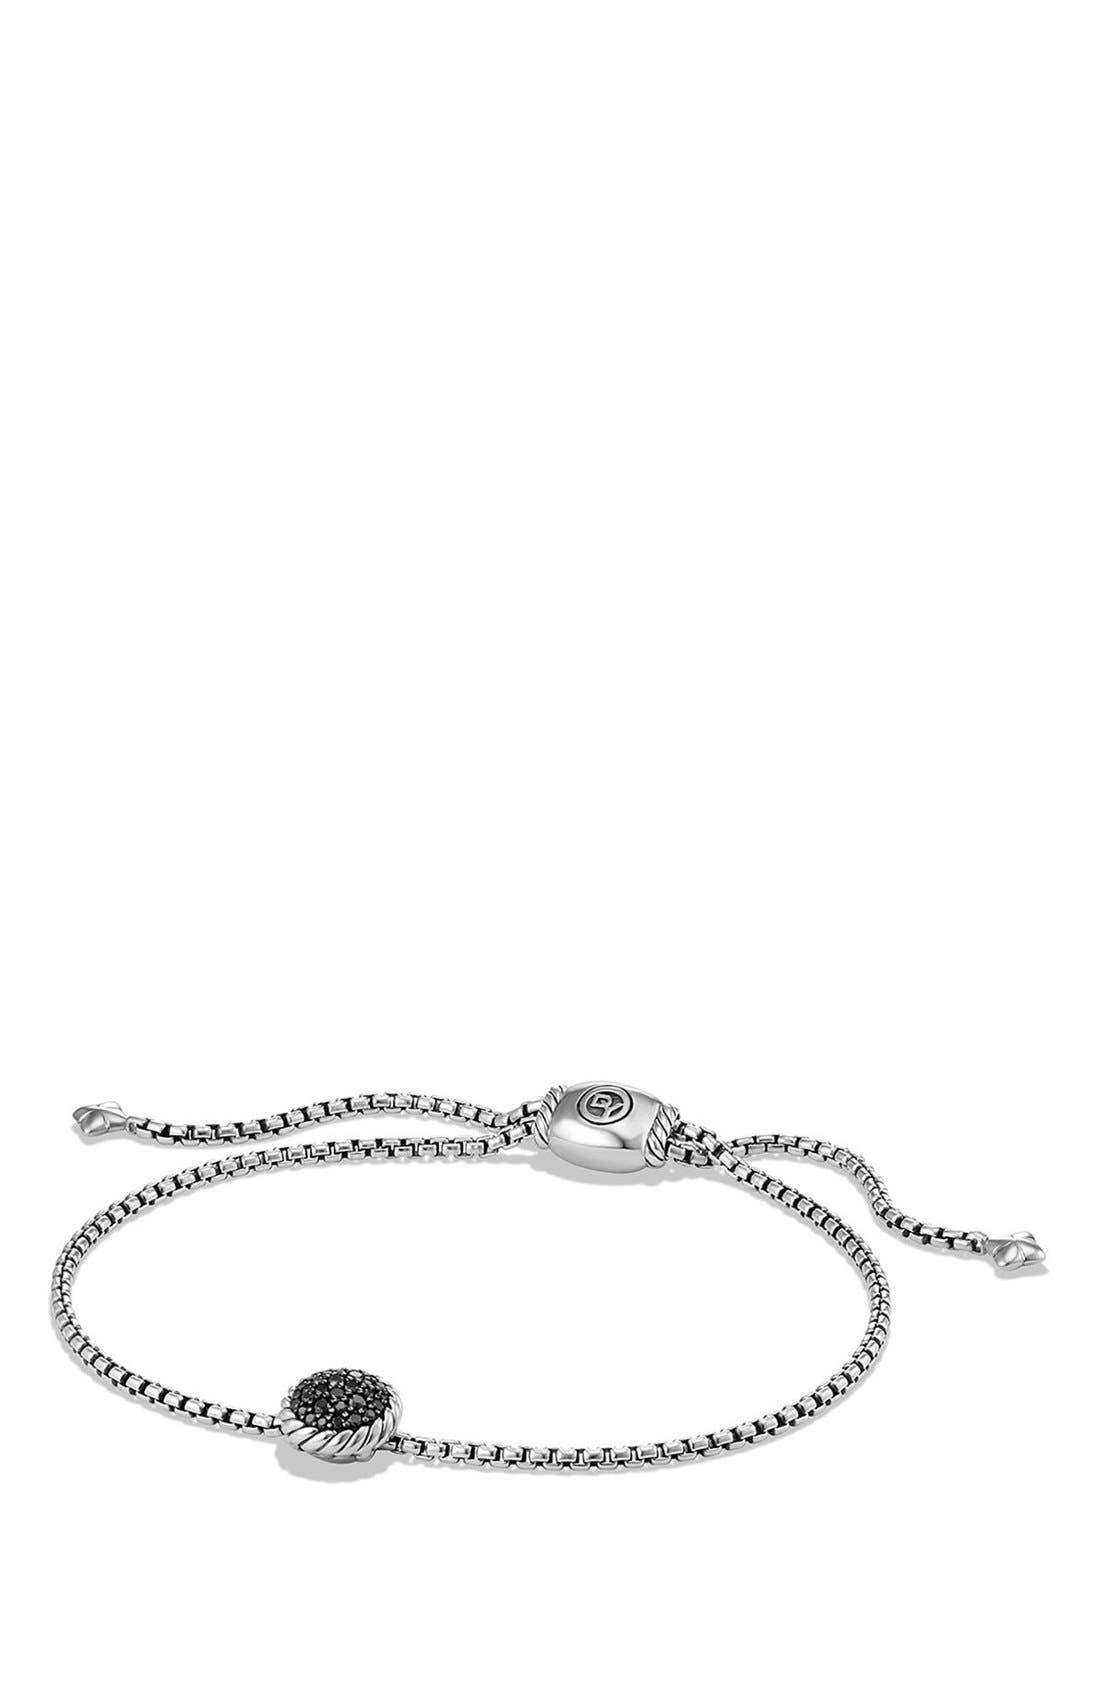 David Yurman 'Châtelaine' Petite Bracelet with Black Diamonds